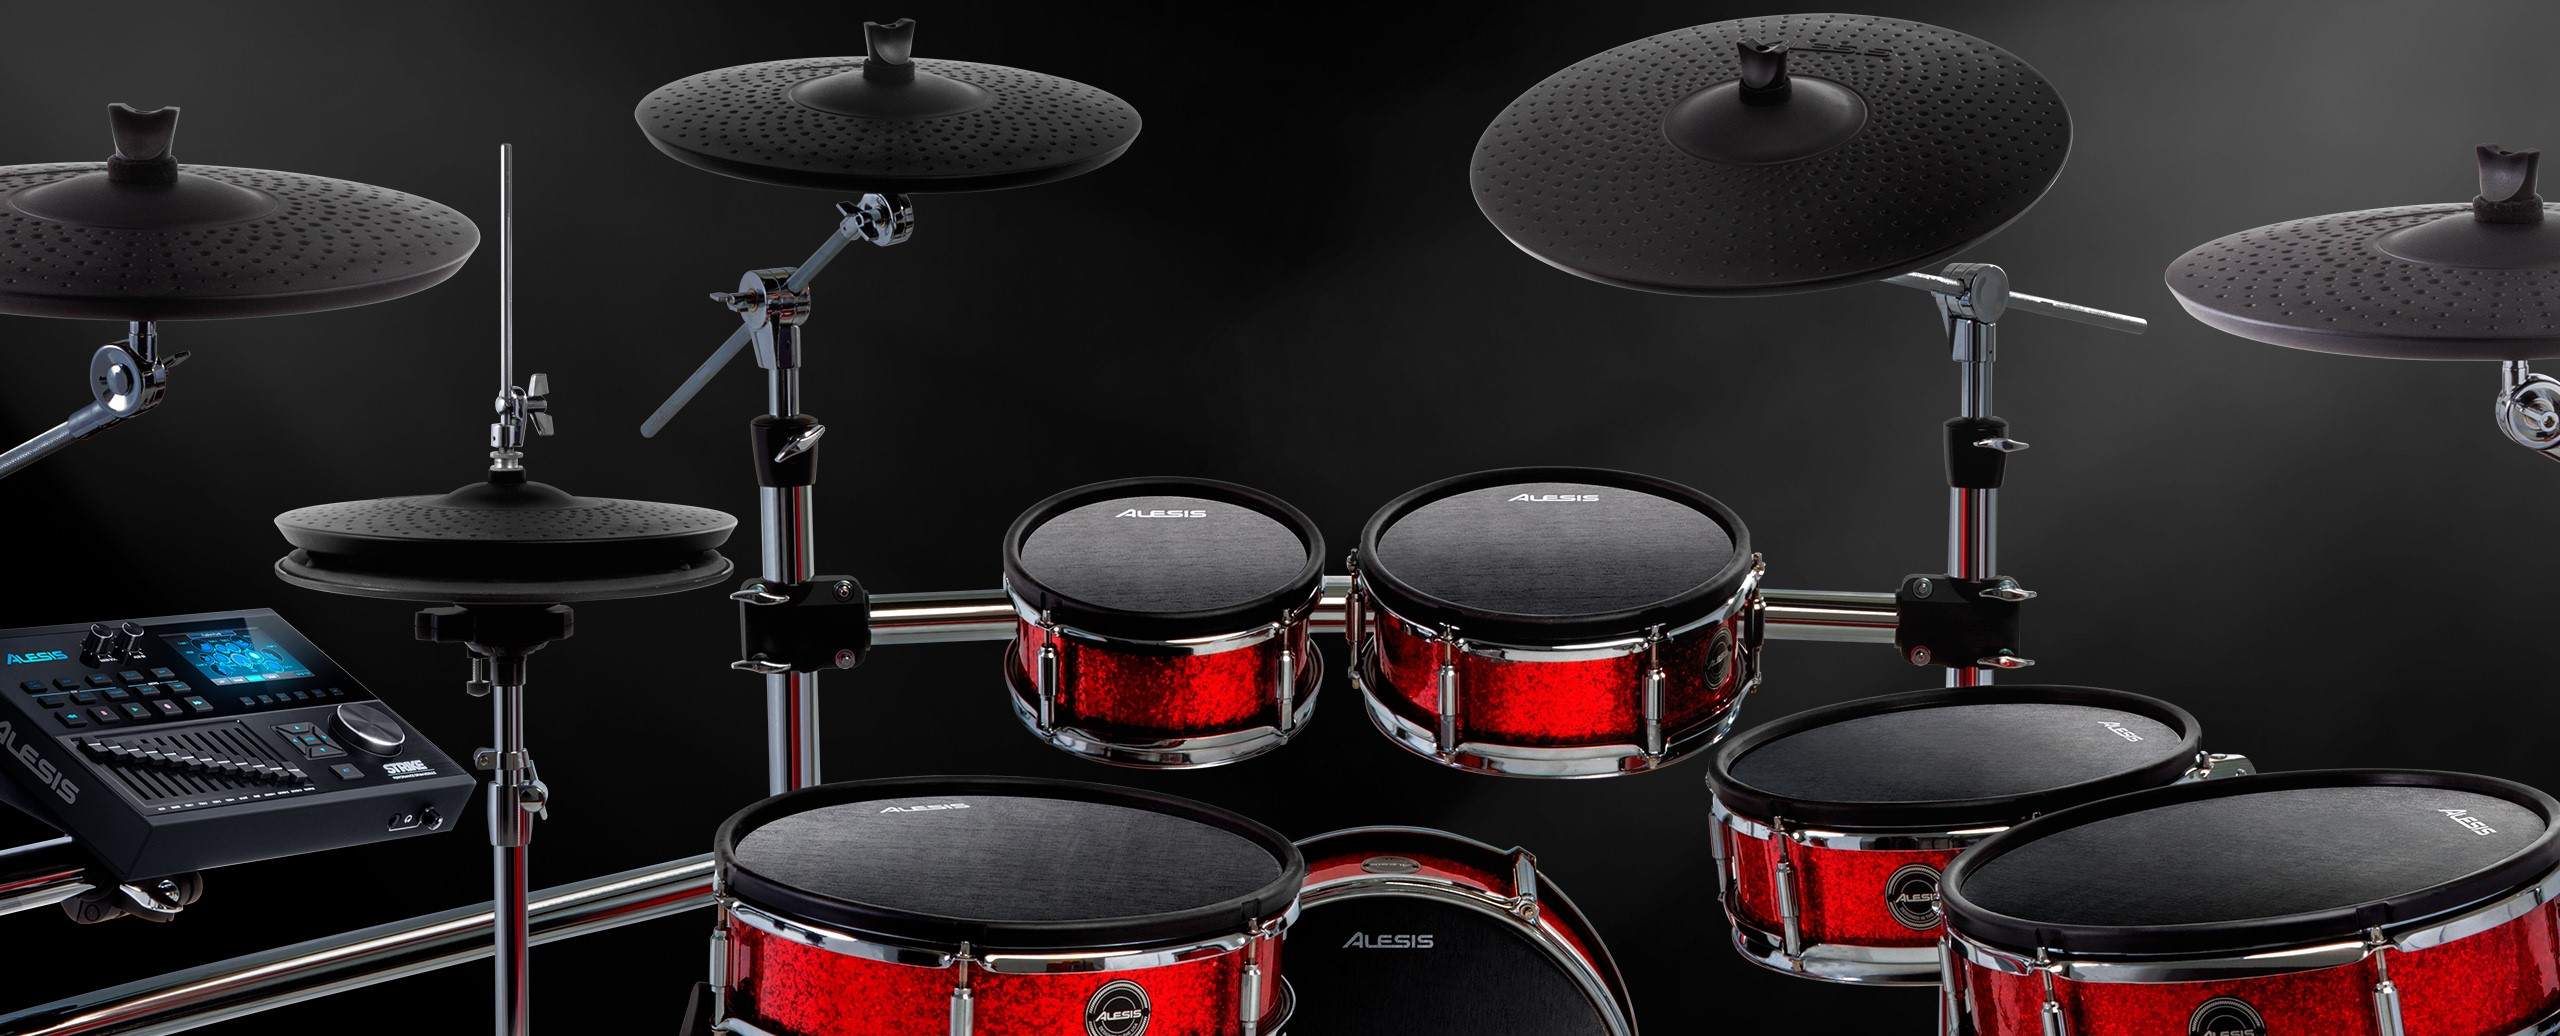 Edrumsbgg electronic drum kits solutioingenieria Images